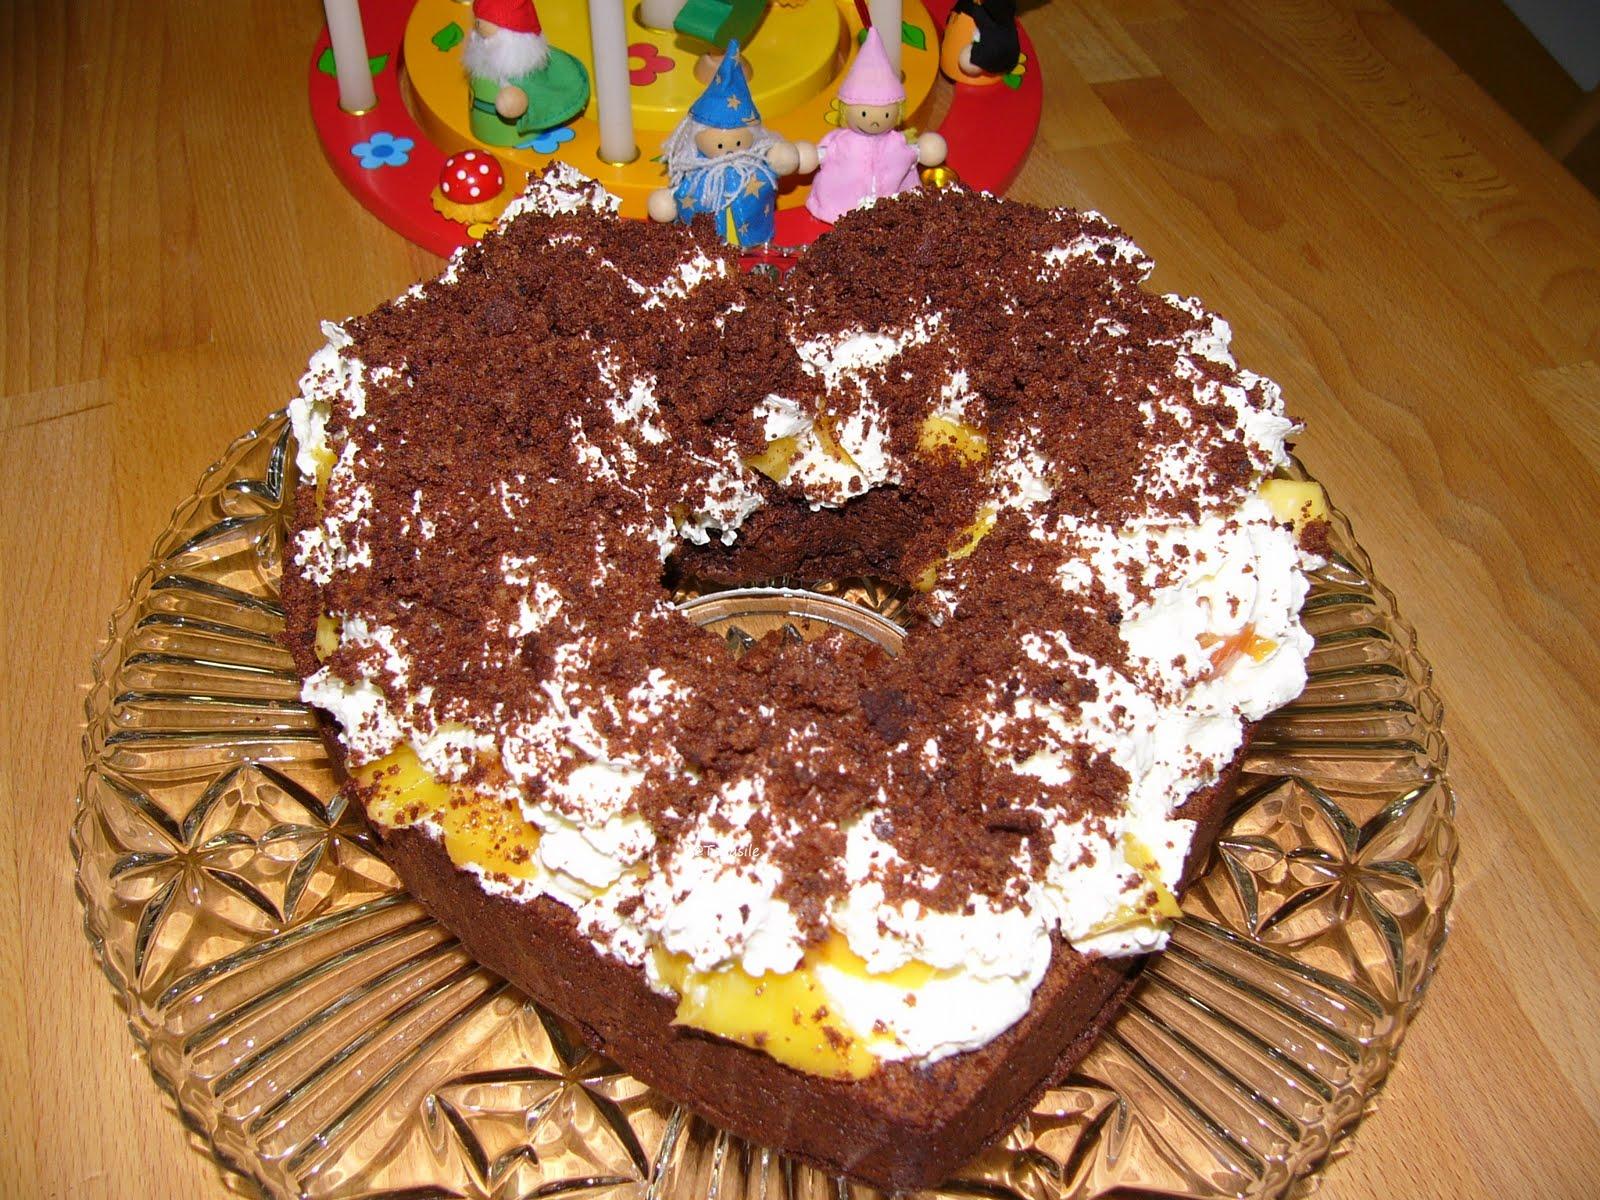 Cake 120 G Dark Chocolate 8 Covered Espressobeans Optional 150 Hazelnuts 65 Butter 35 Coconut Oil Or 100 Rapadura